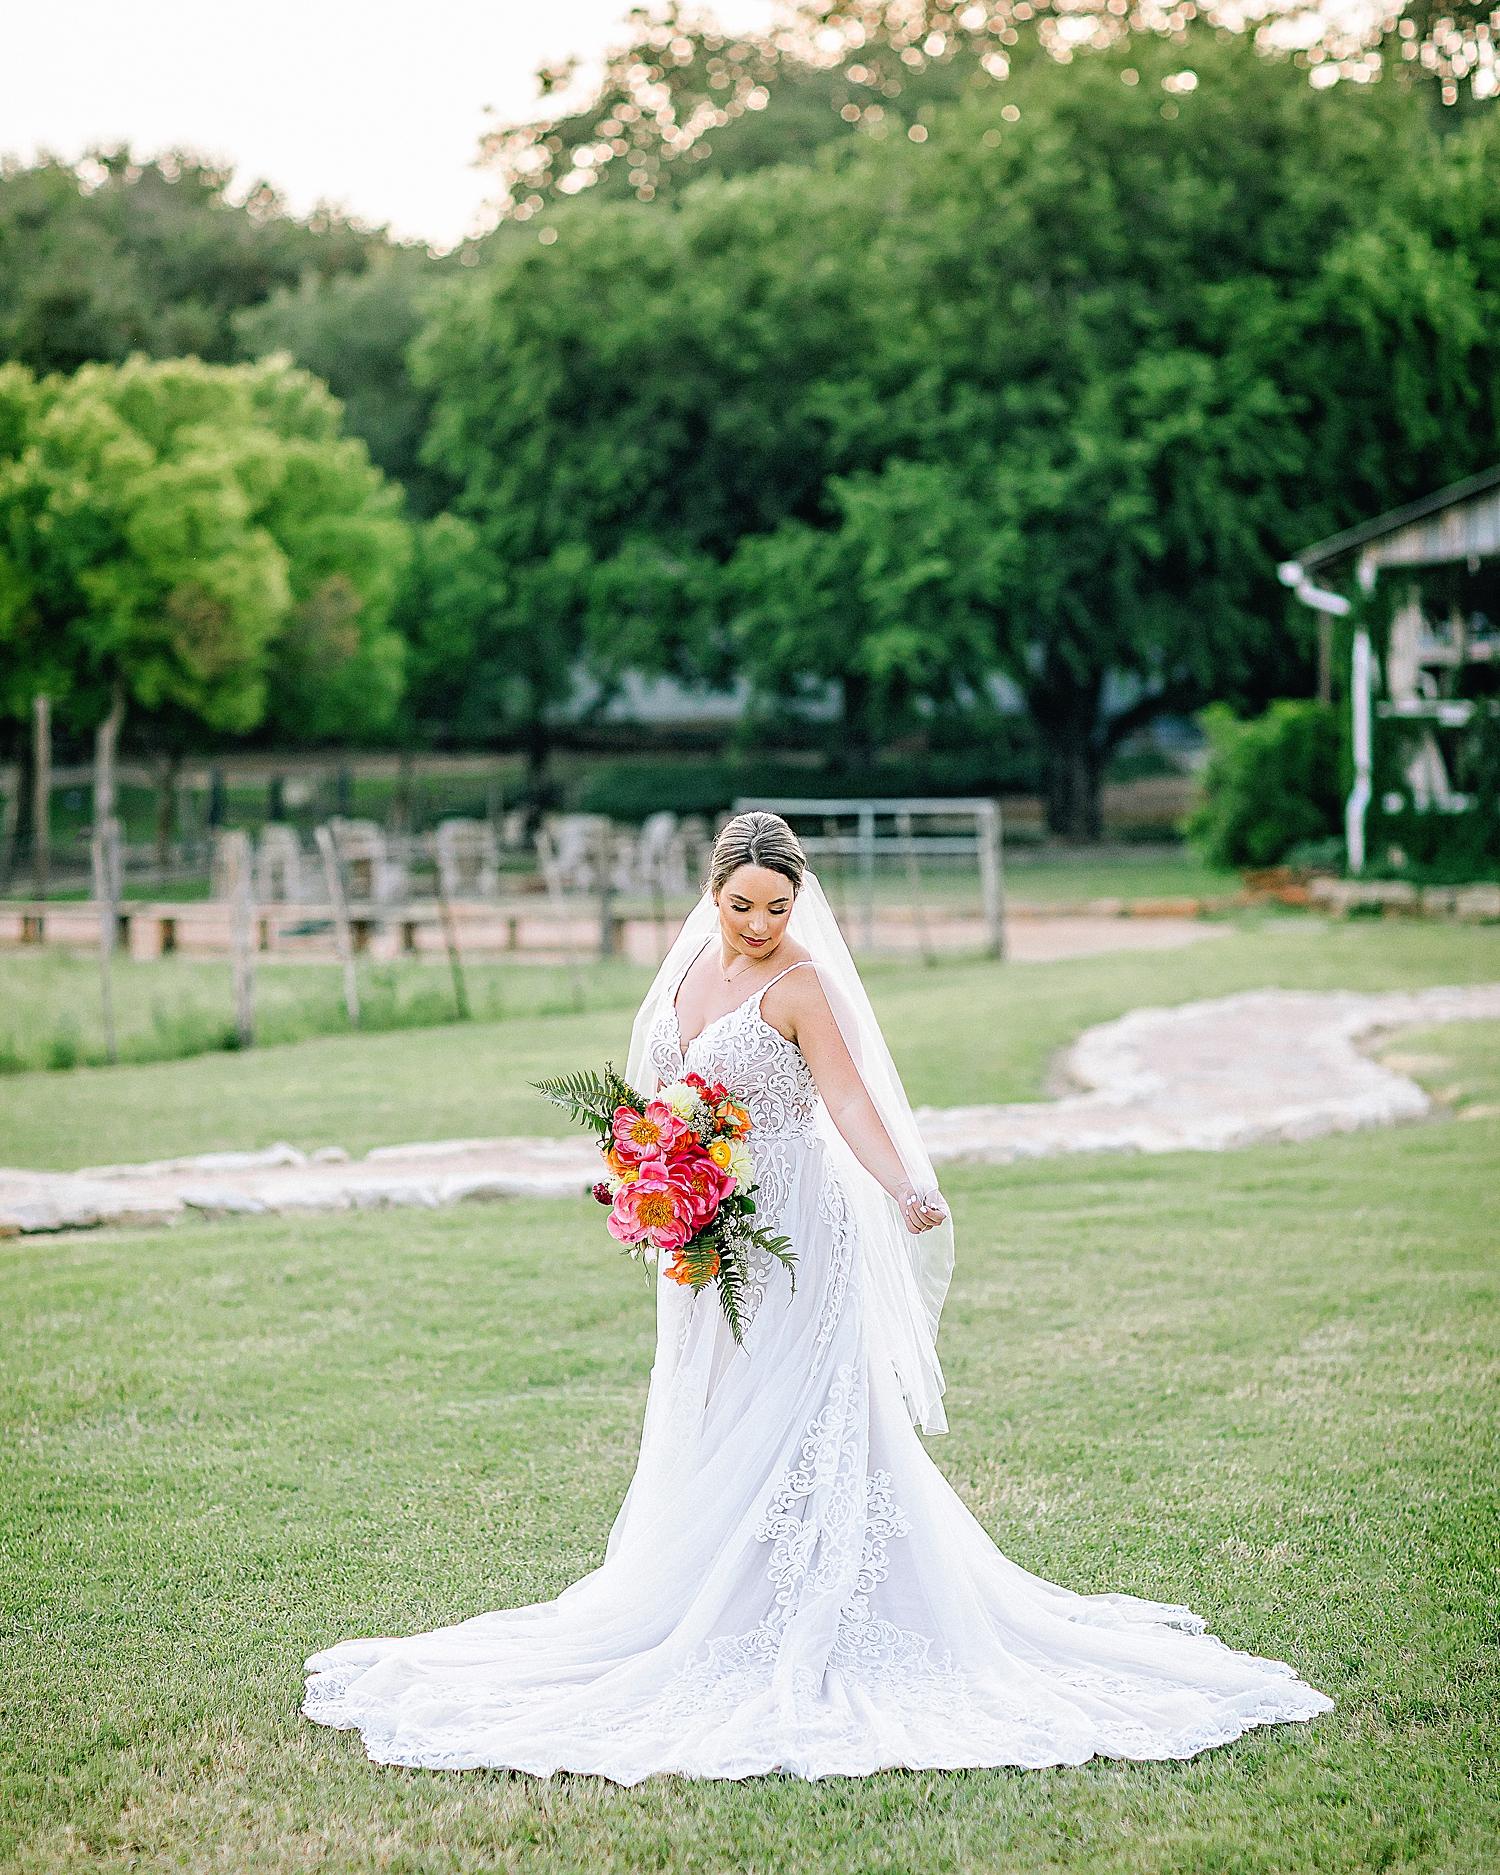 Gruene-Estate-Wedding-New-Braunfels-Bride-Bridal-Photos-Carly-Barton-Photography_0035.jpg